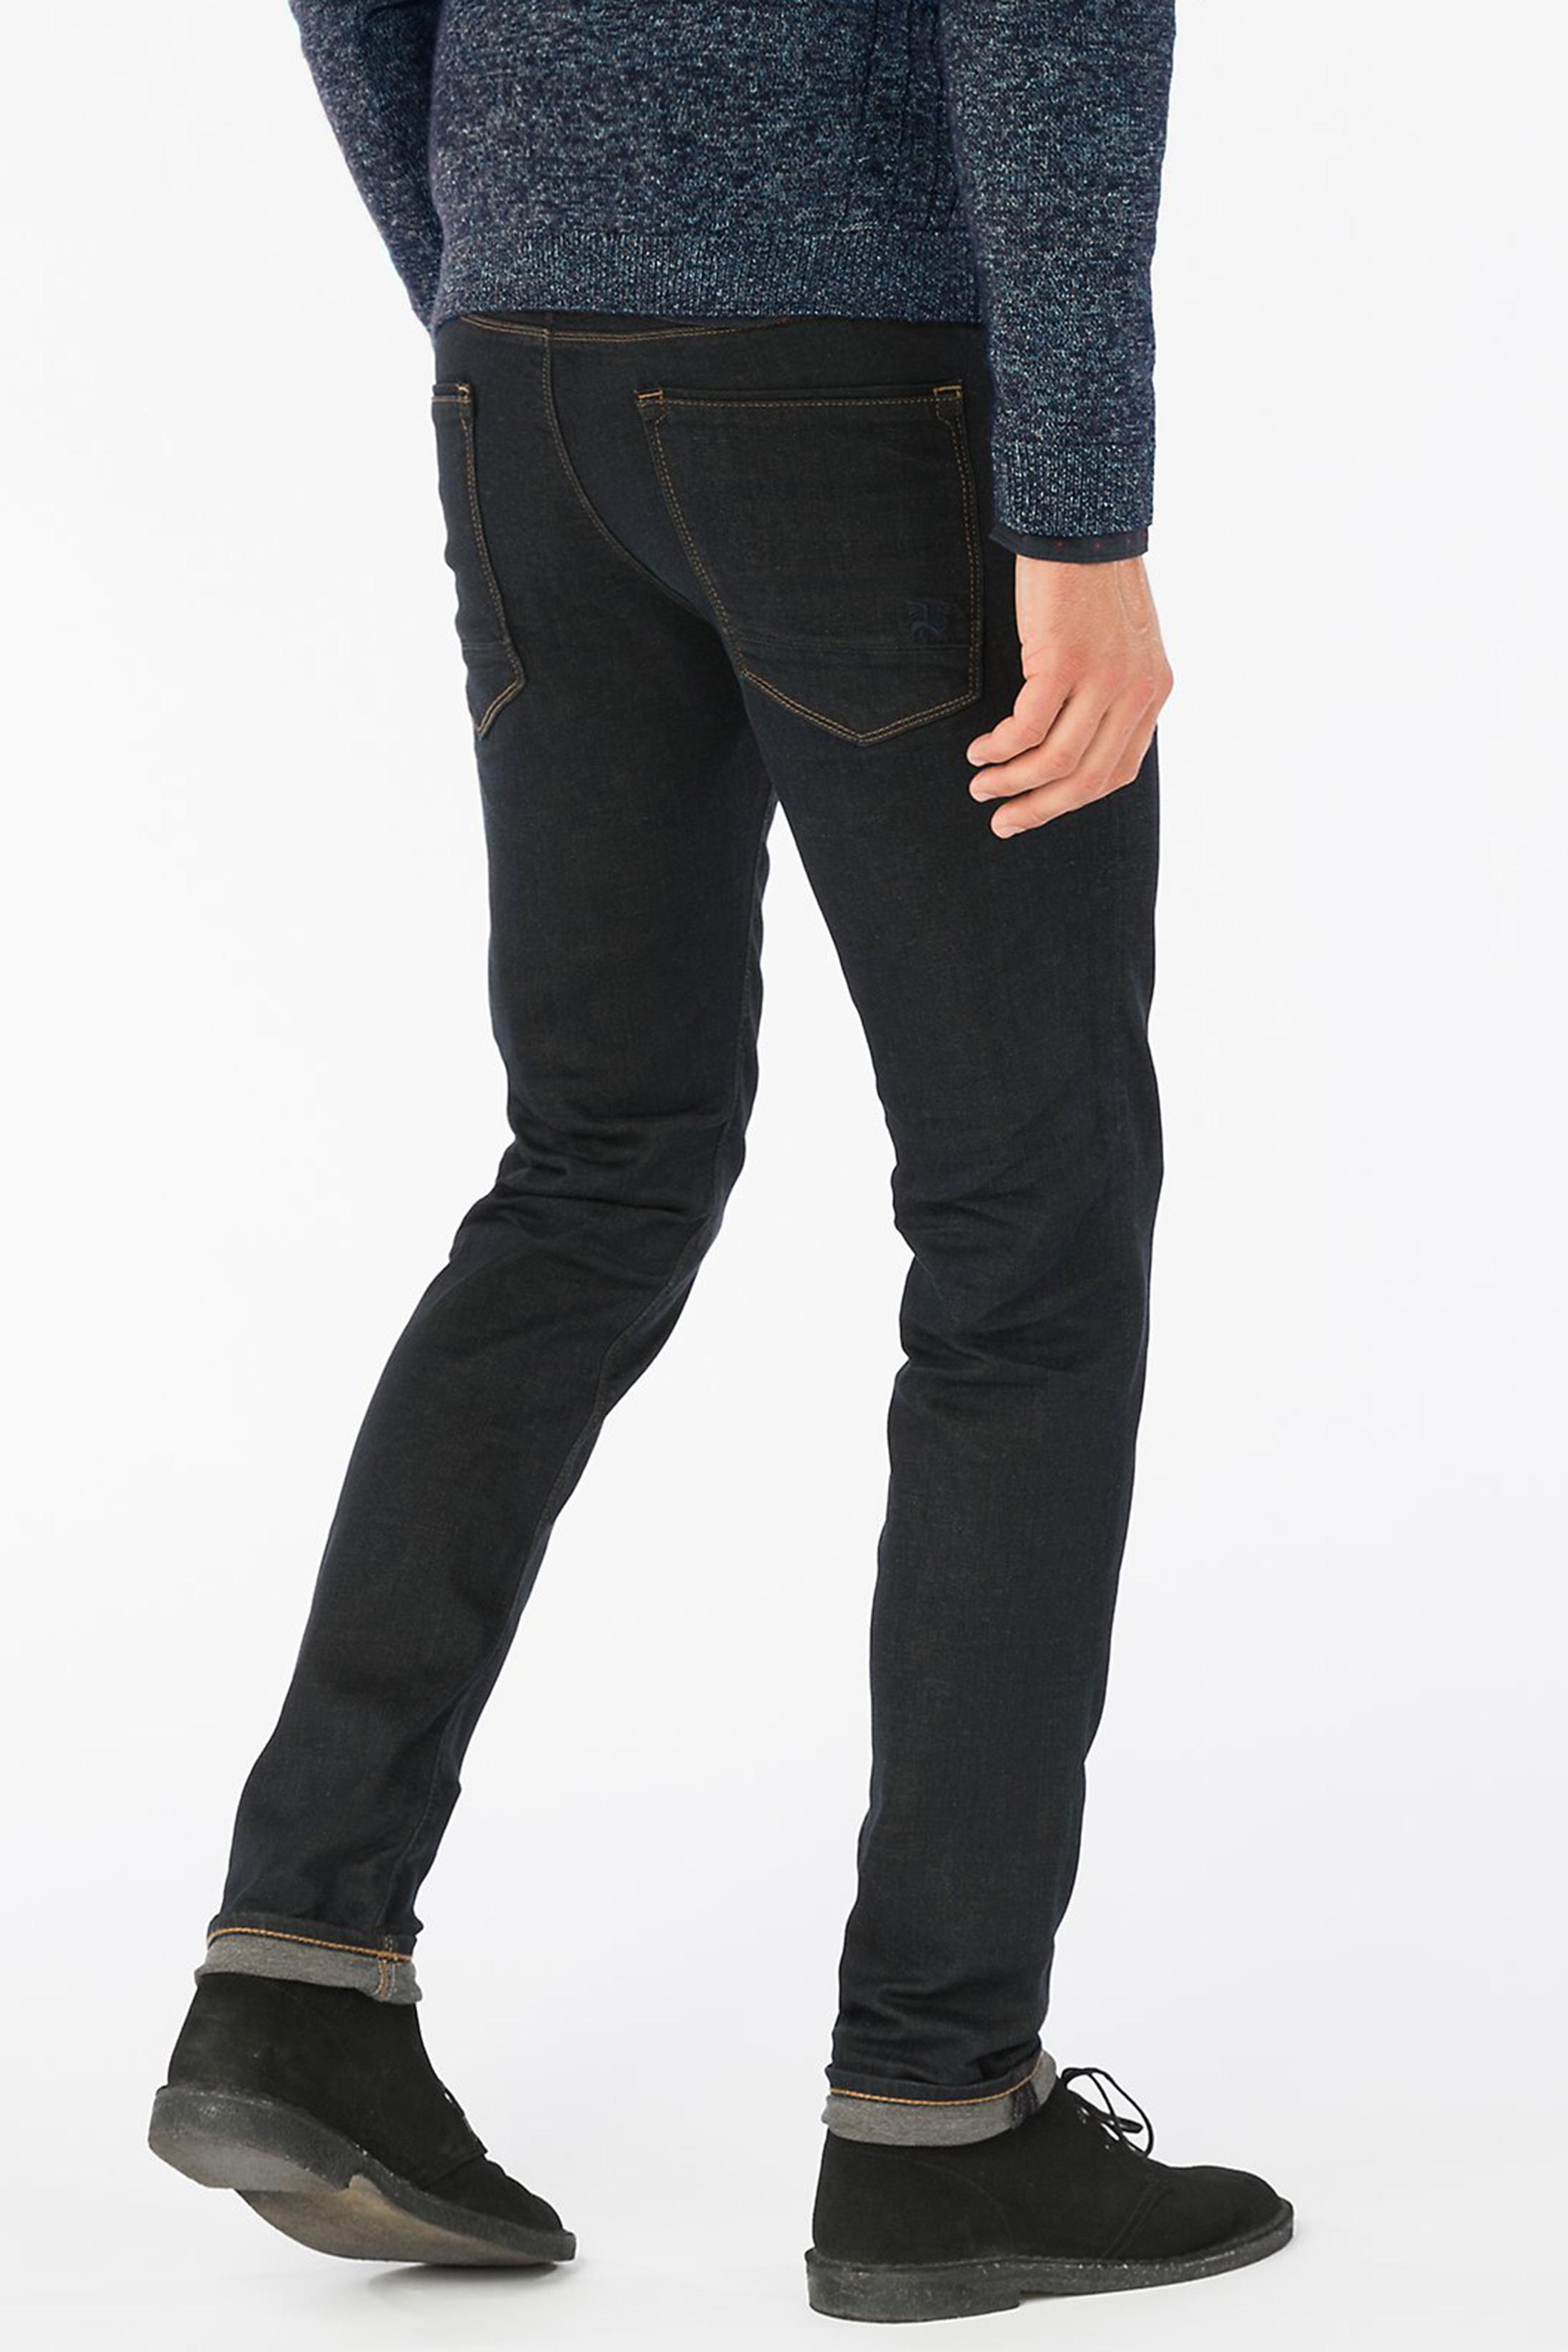 Vanguard V7 Slim Jeans Stretch CCR